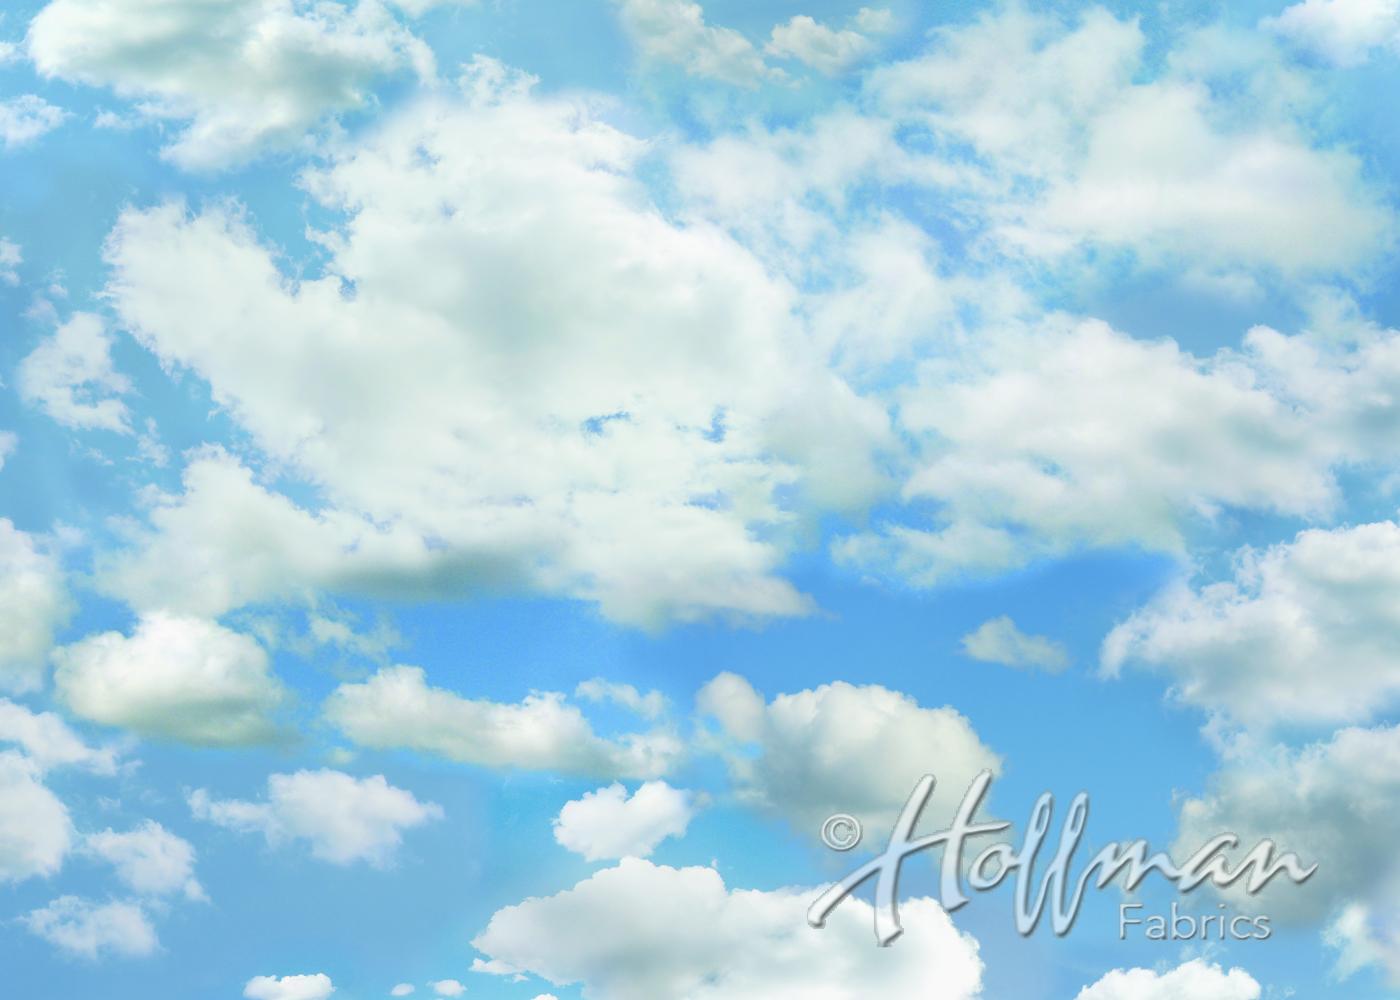 a hoffman digital spectrum print -wide open spaces - the sky